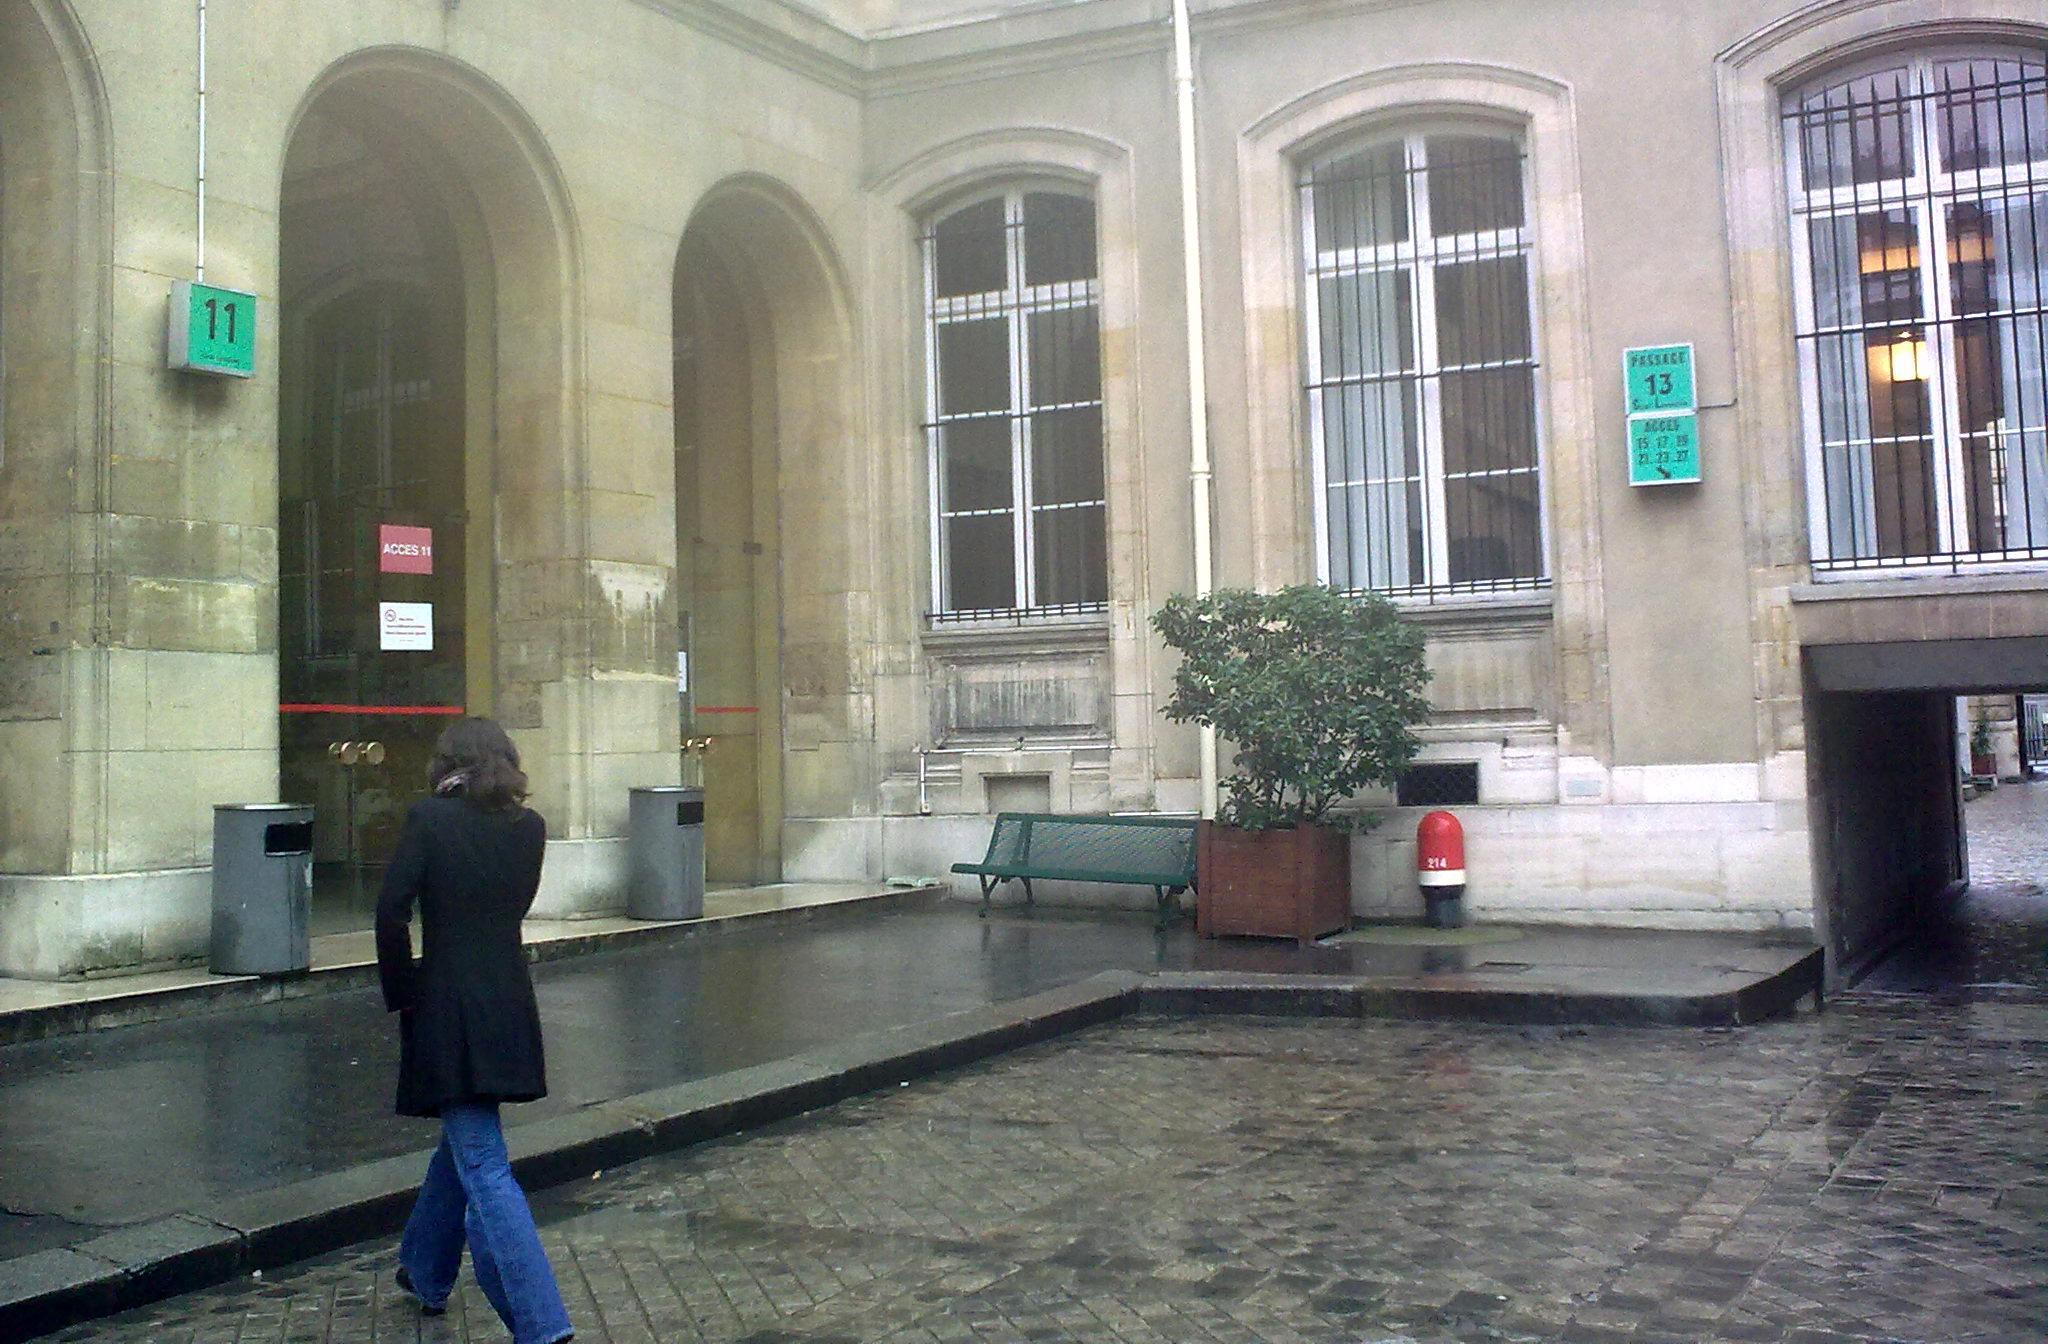 Entrance 11